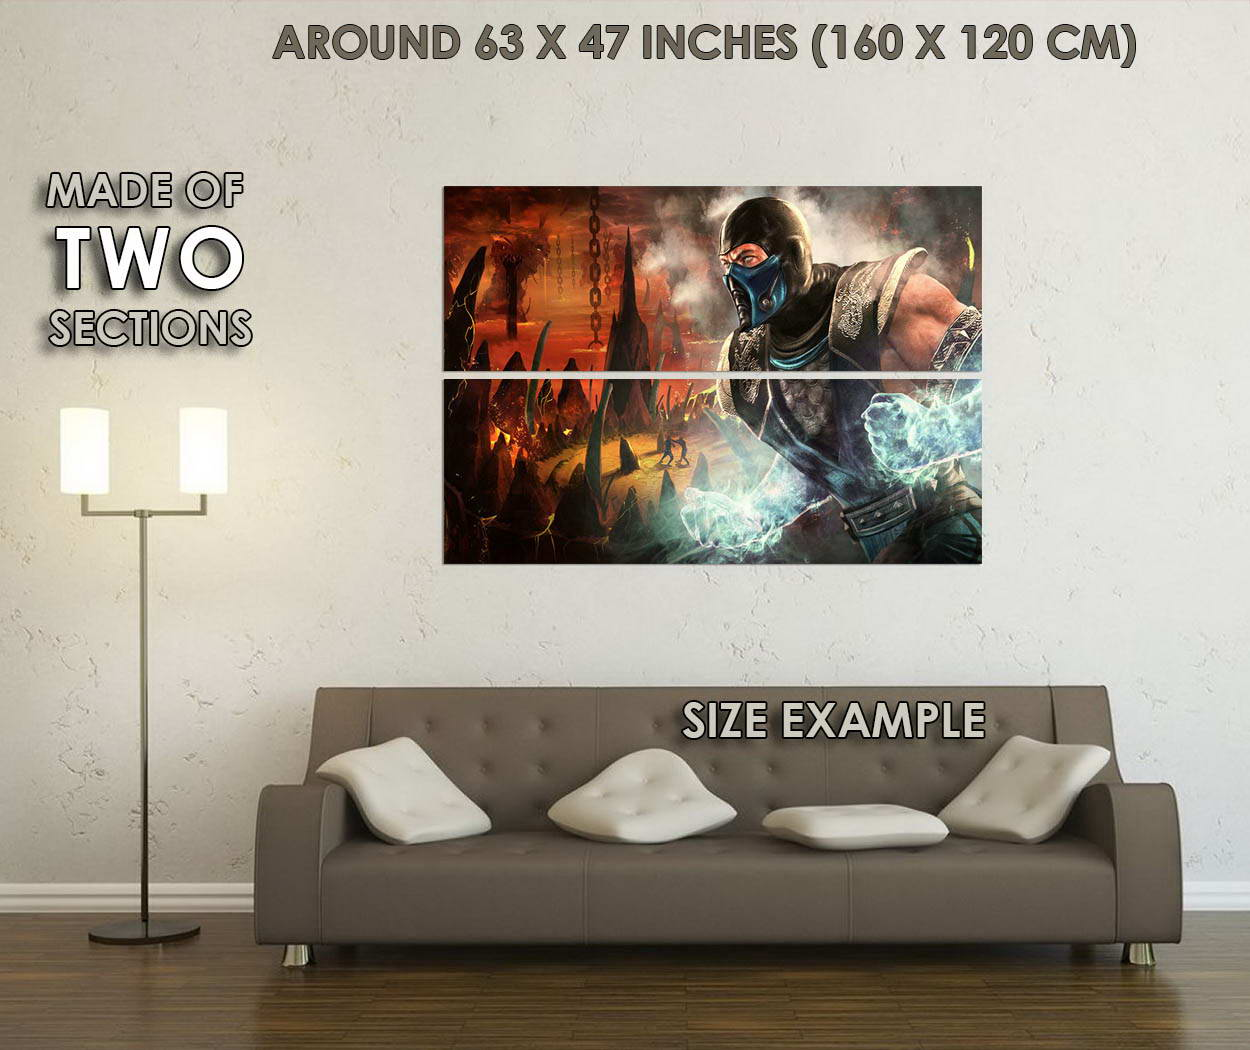 10707-Mortal-Kombat-X-MK-Hot-Fighting-Game-Art-LAMINATED-POSTER-CA thumbnail 6